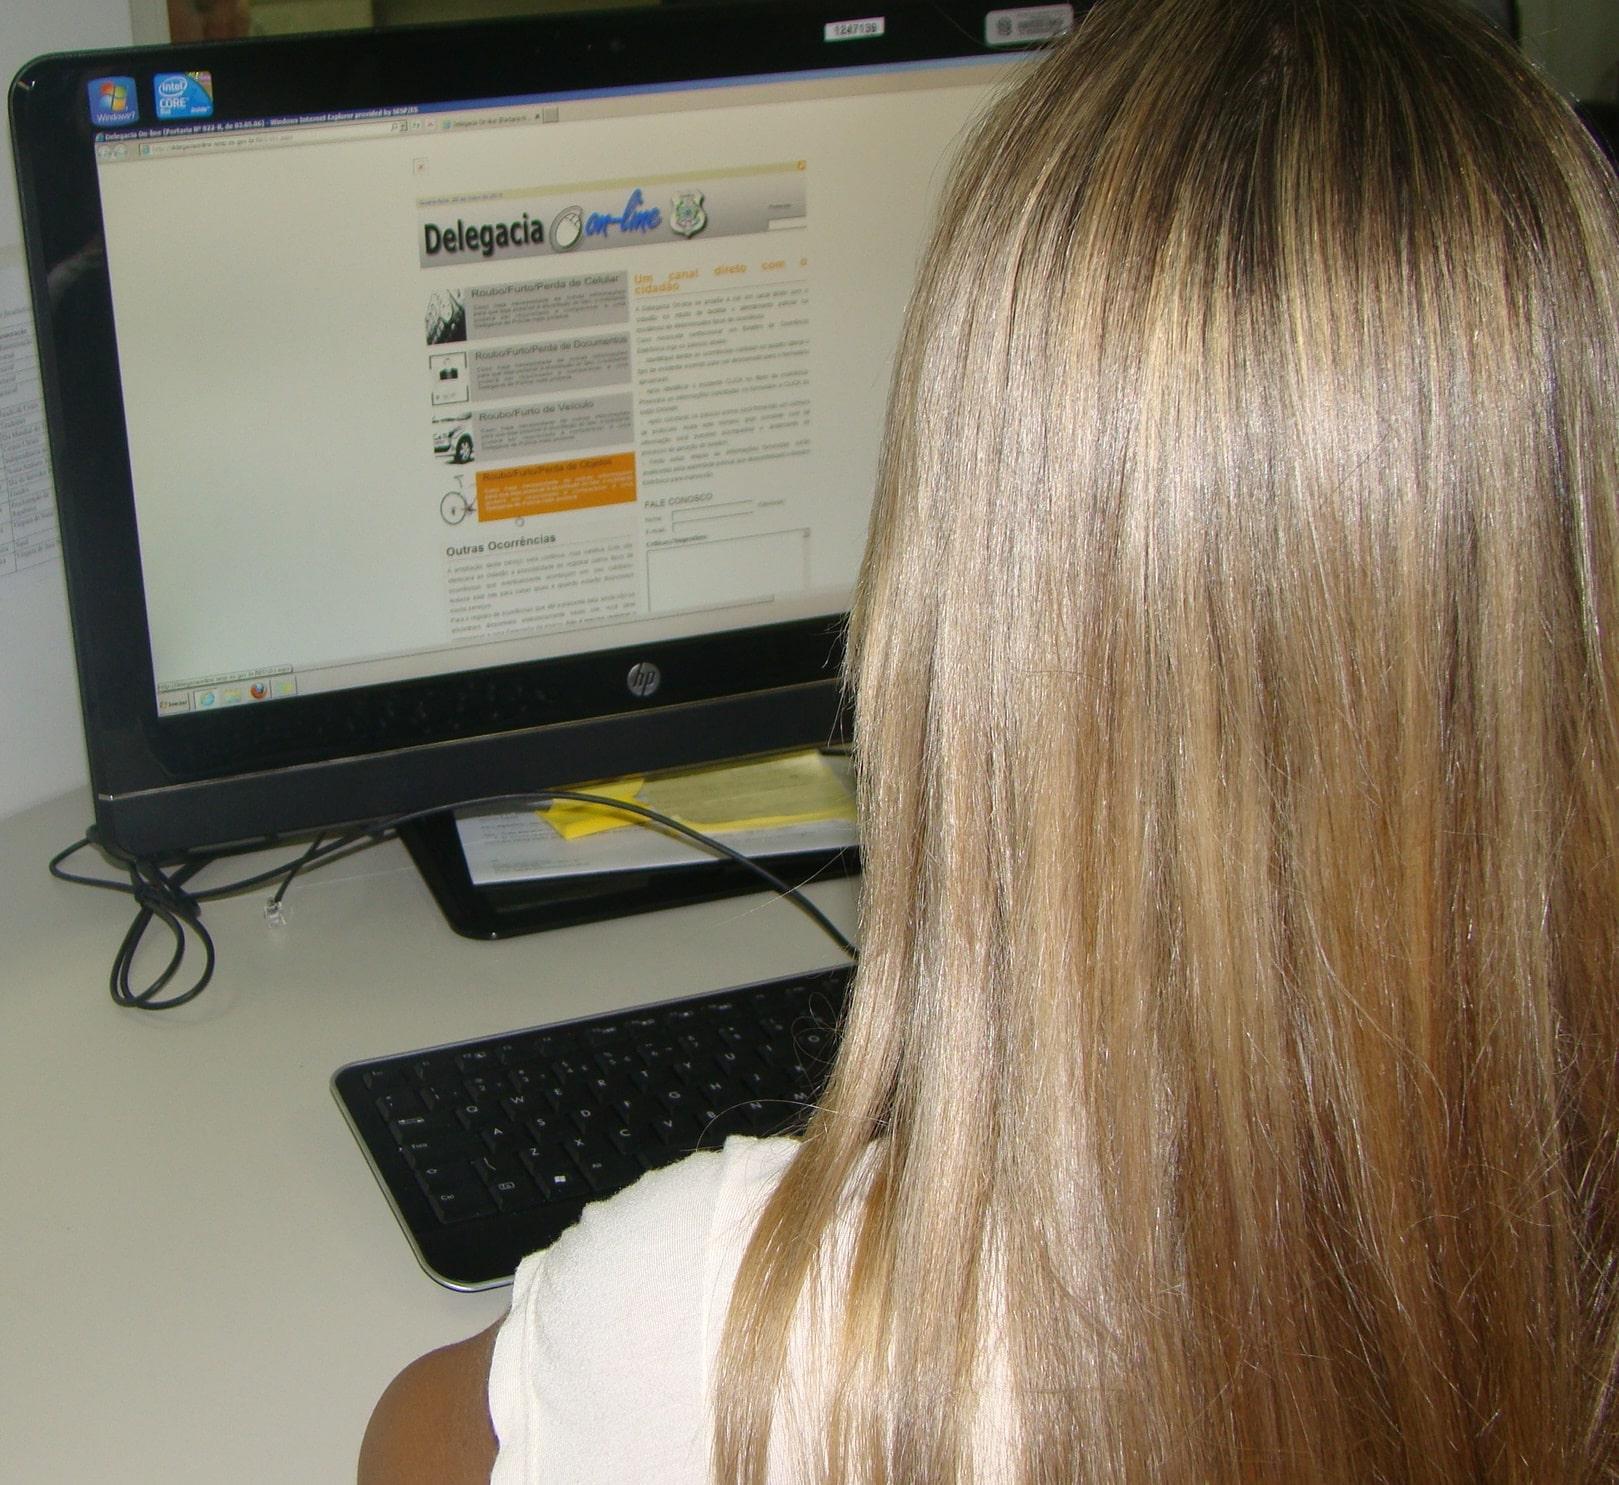 delegacia online